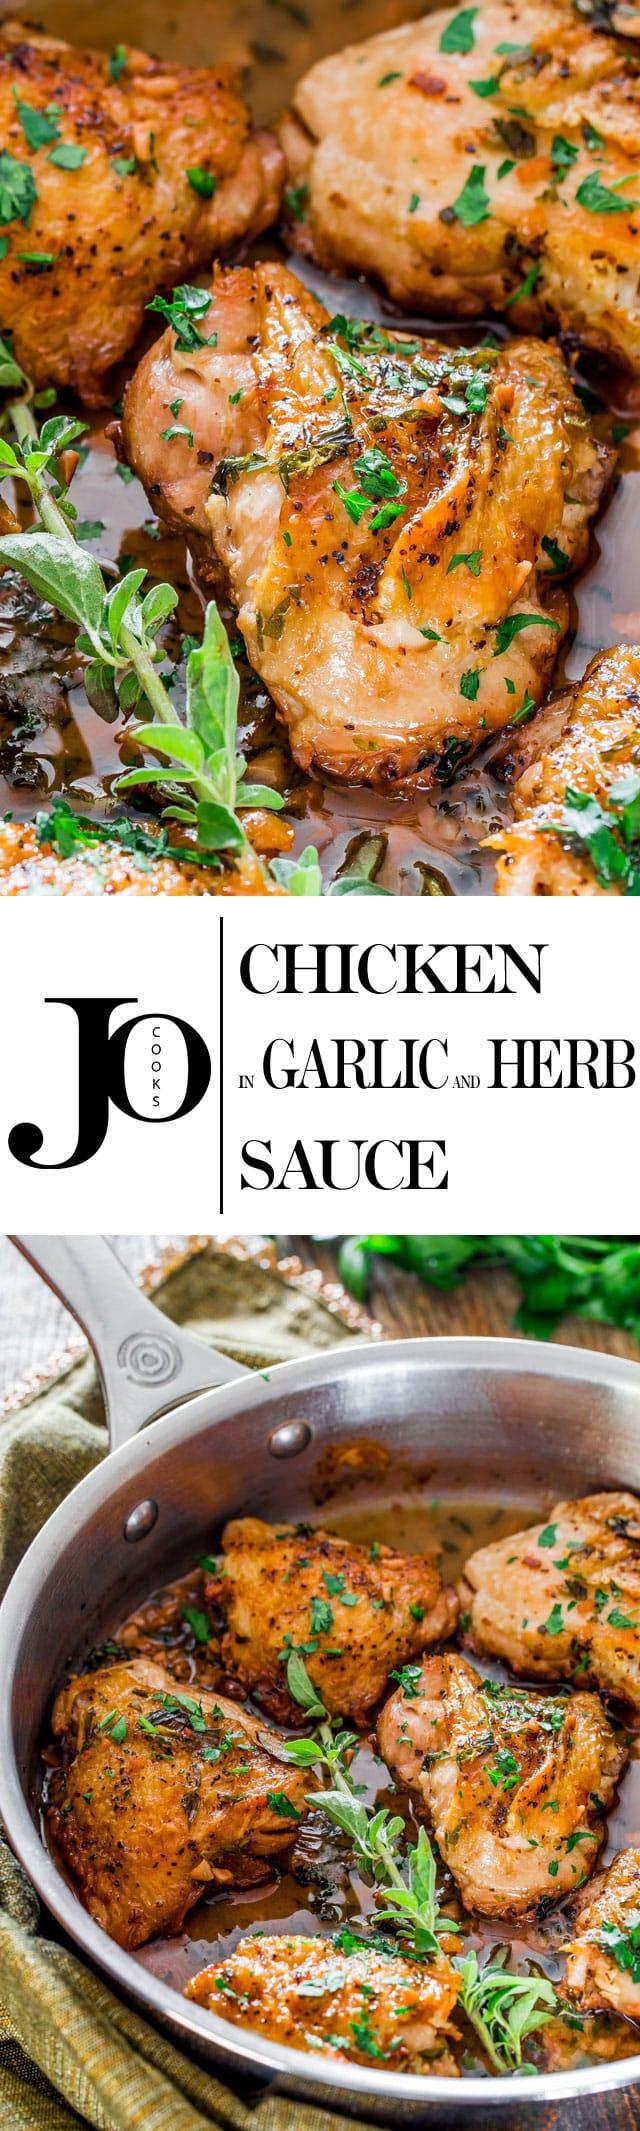 Chicken in Garlic and Herb Sauce - Jo Cooks